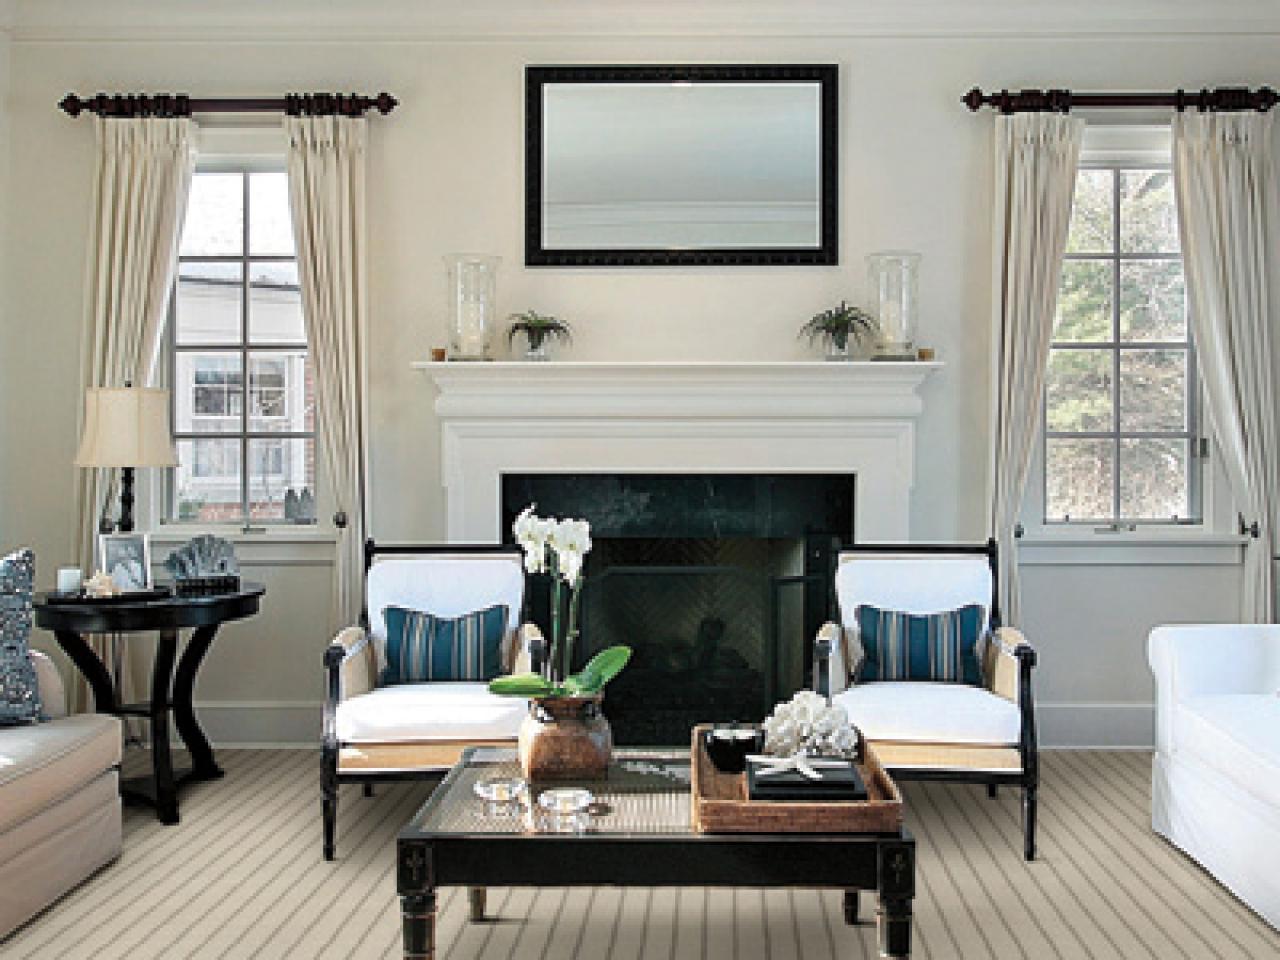 Top Living Room Flooring Options HGTV - Carpet designs for living room